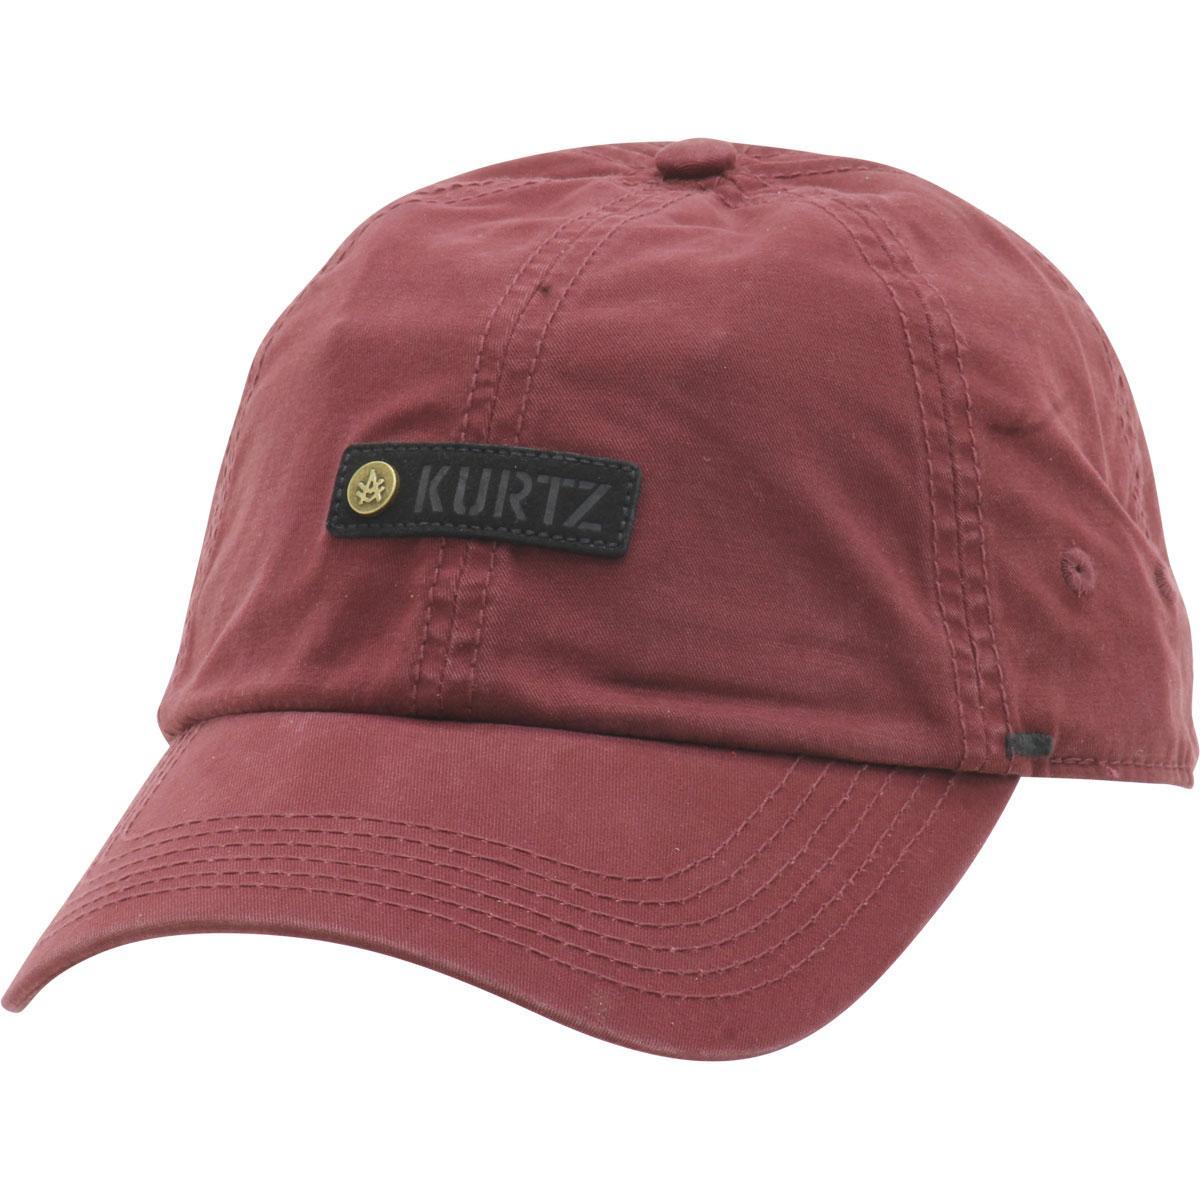 Image of Kurtz Men's Chino Corps Baseball Cap Hat - Steeled Crimson  - One Size Fits Most